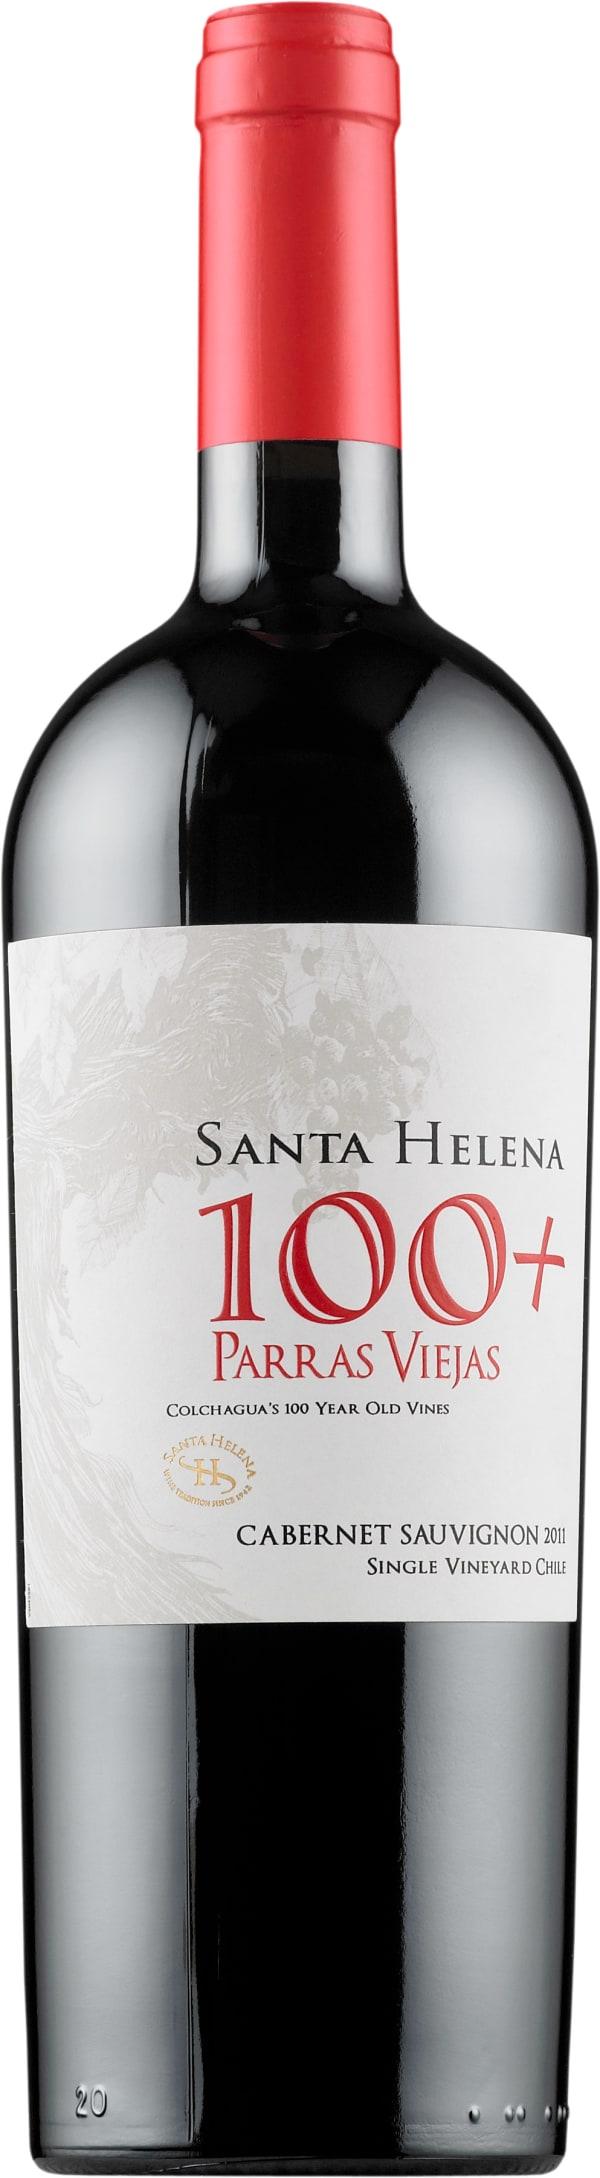 Santa Helena 100+ Parras Viejas Cabernet Sauvignon 2014